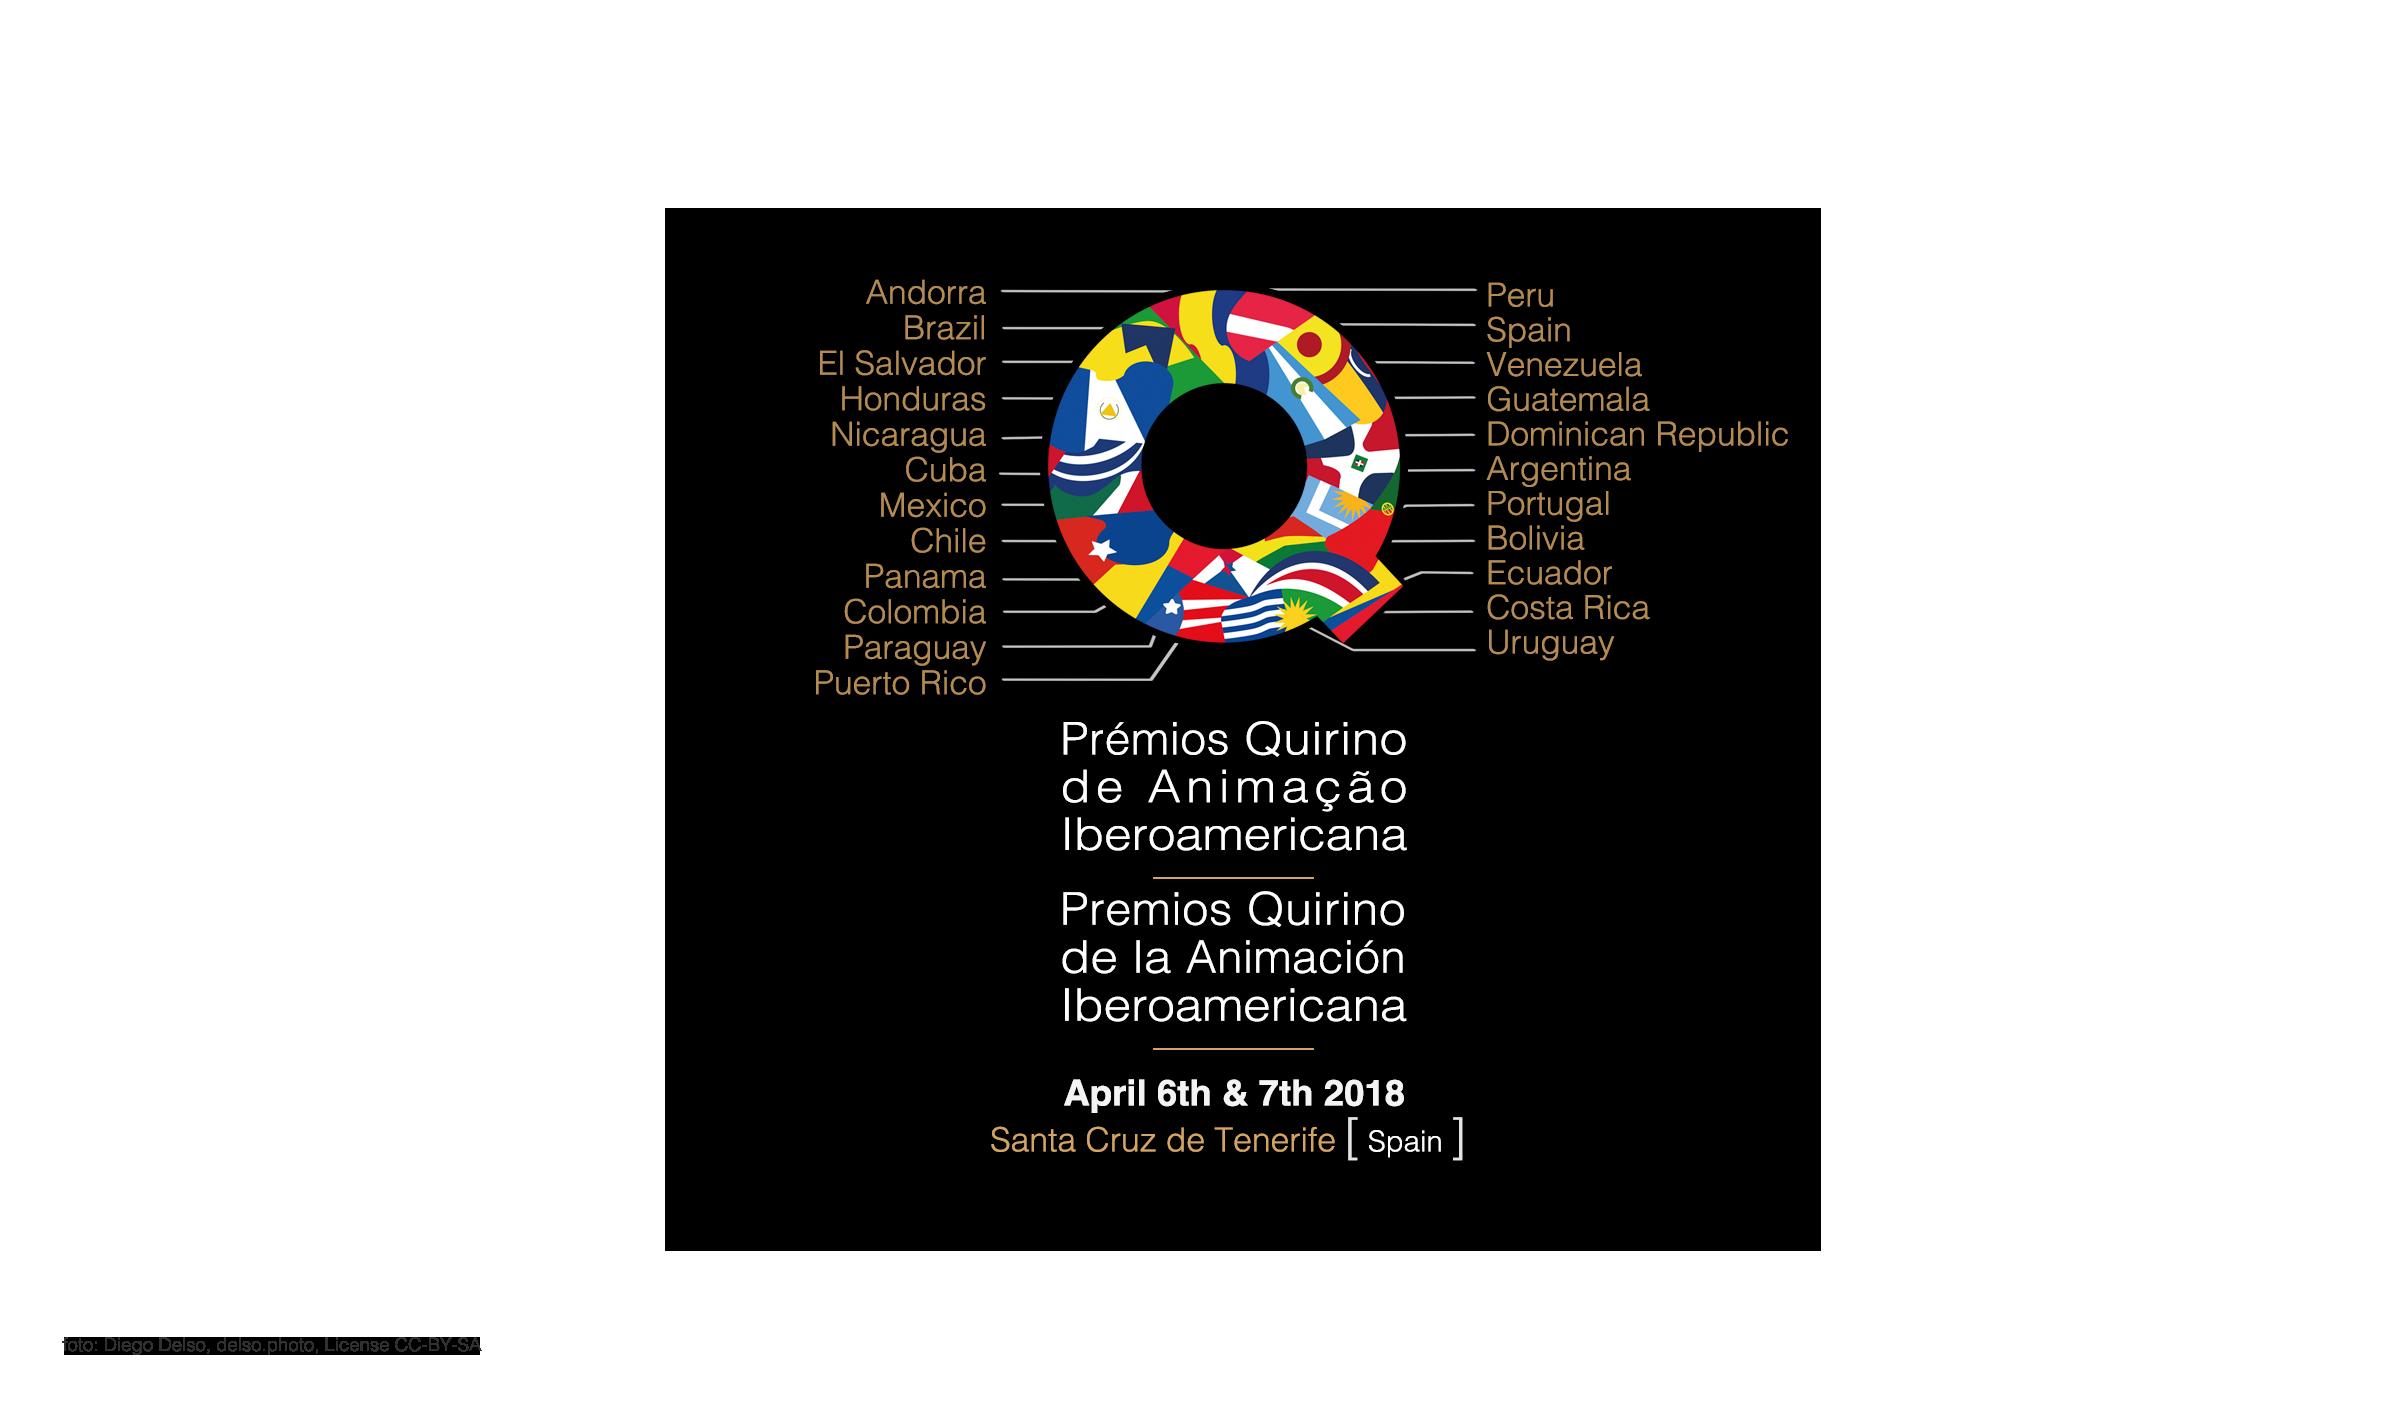 Cartel de Premios Quirino